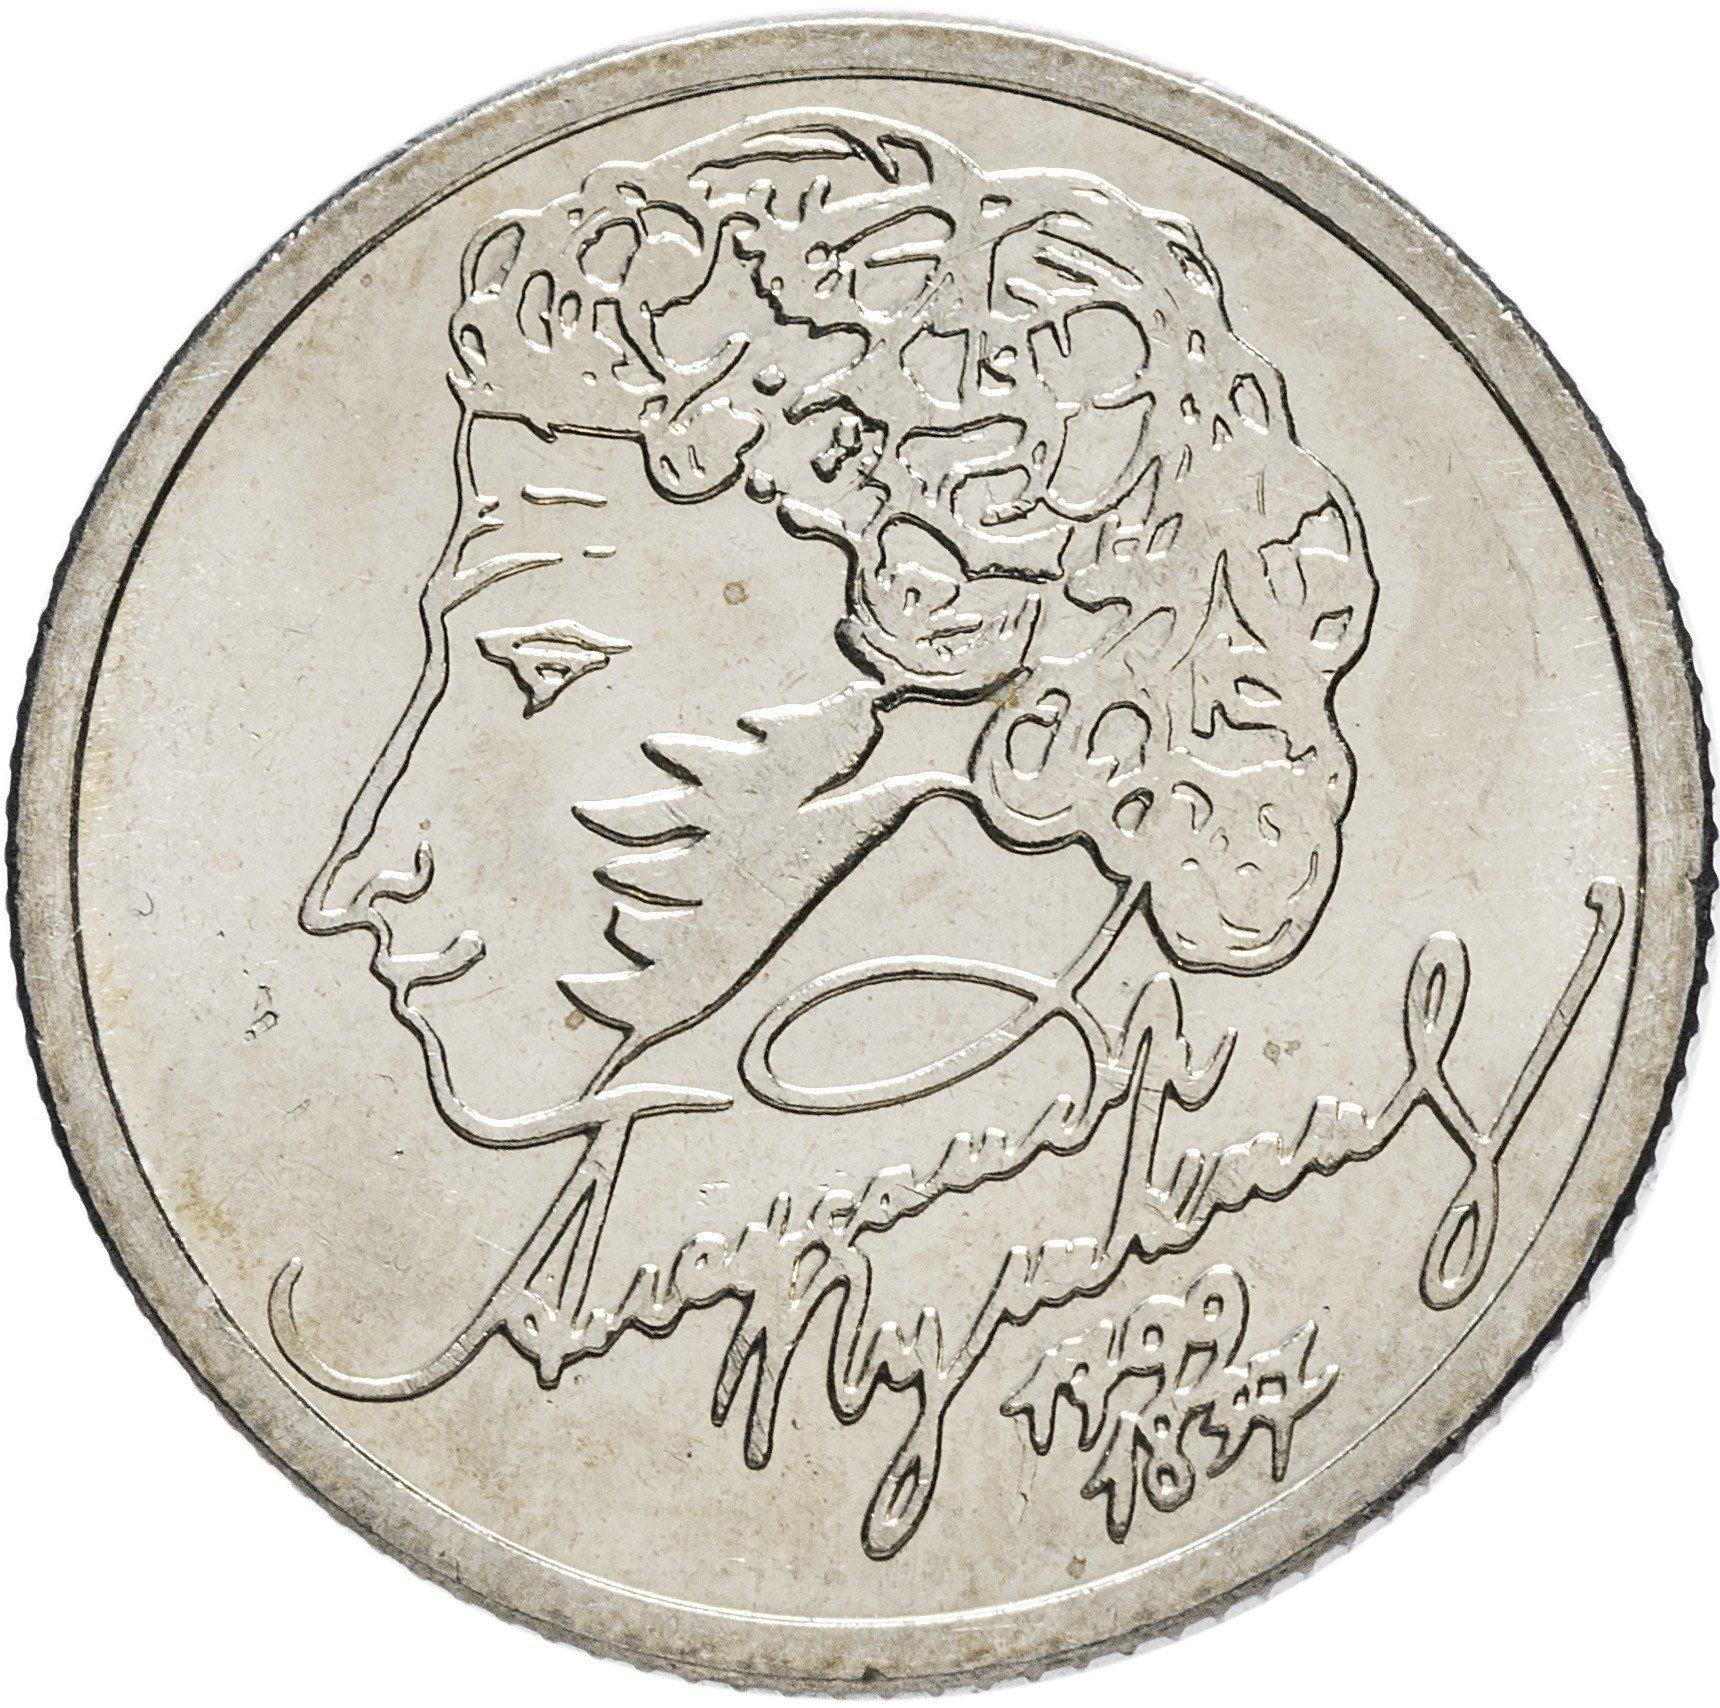 1 рубль 200-летие со дня рождения А.С. Пушкина 1999 г. ММД